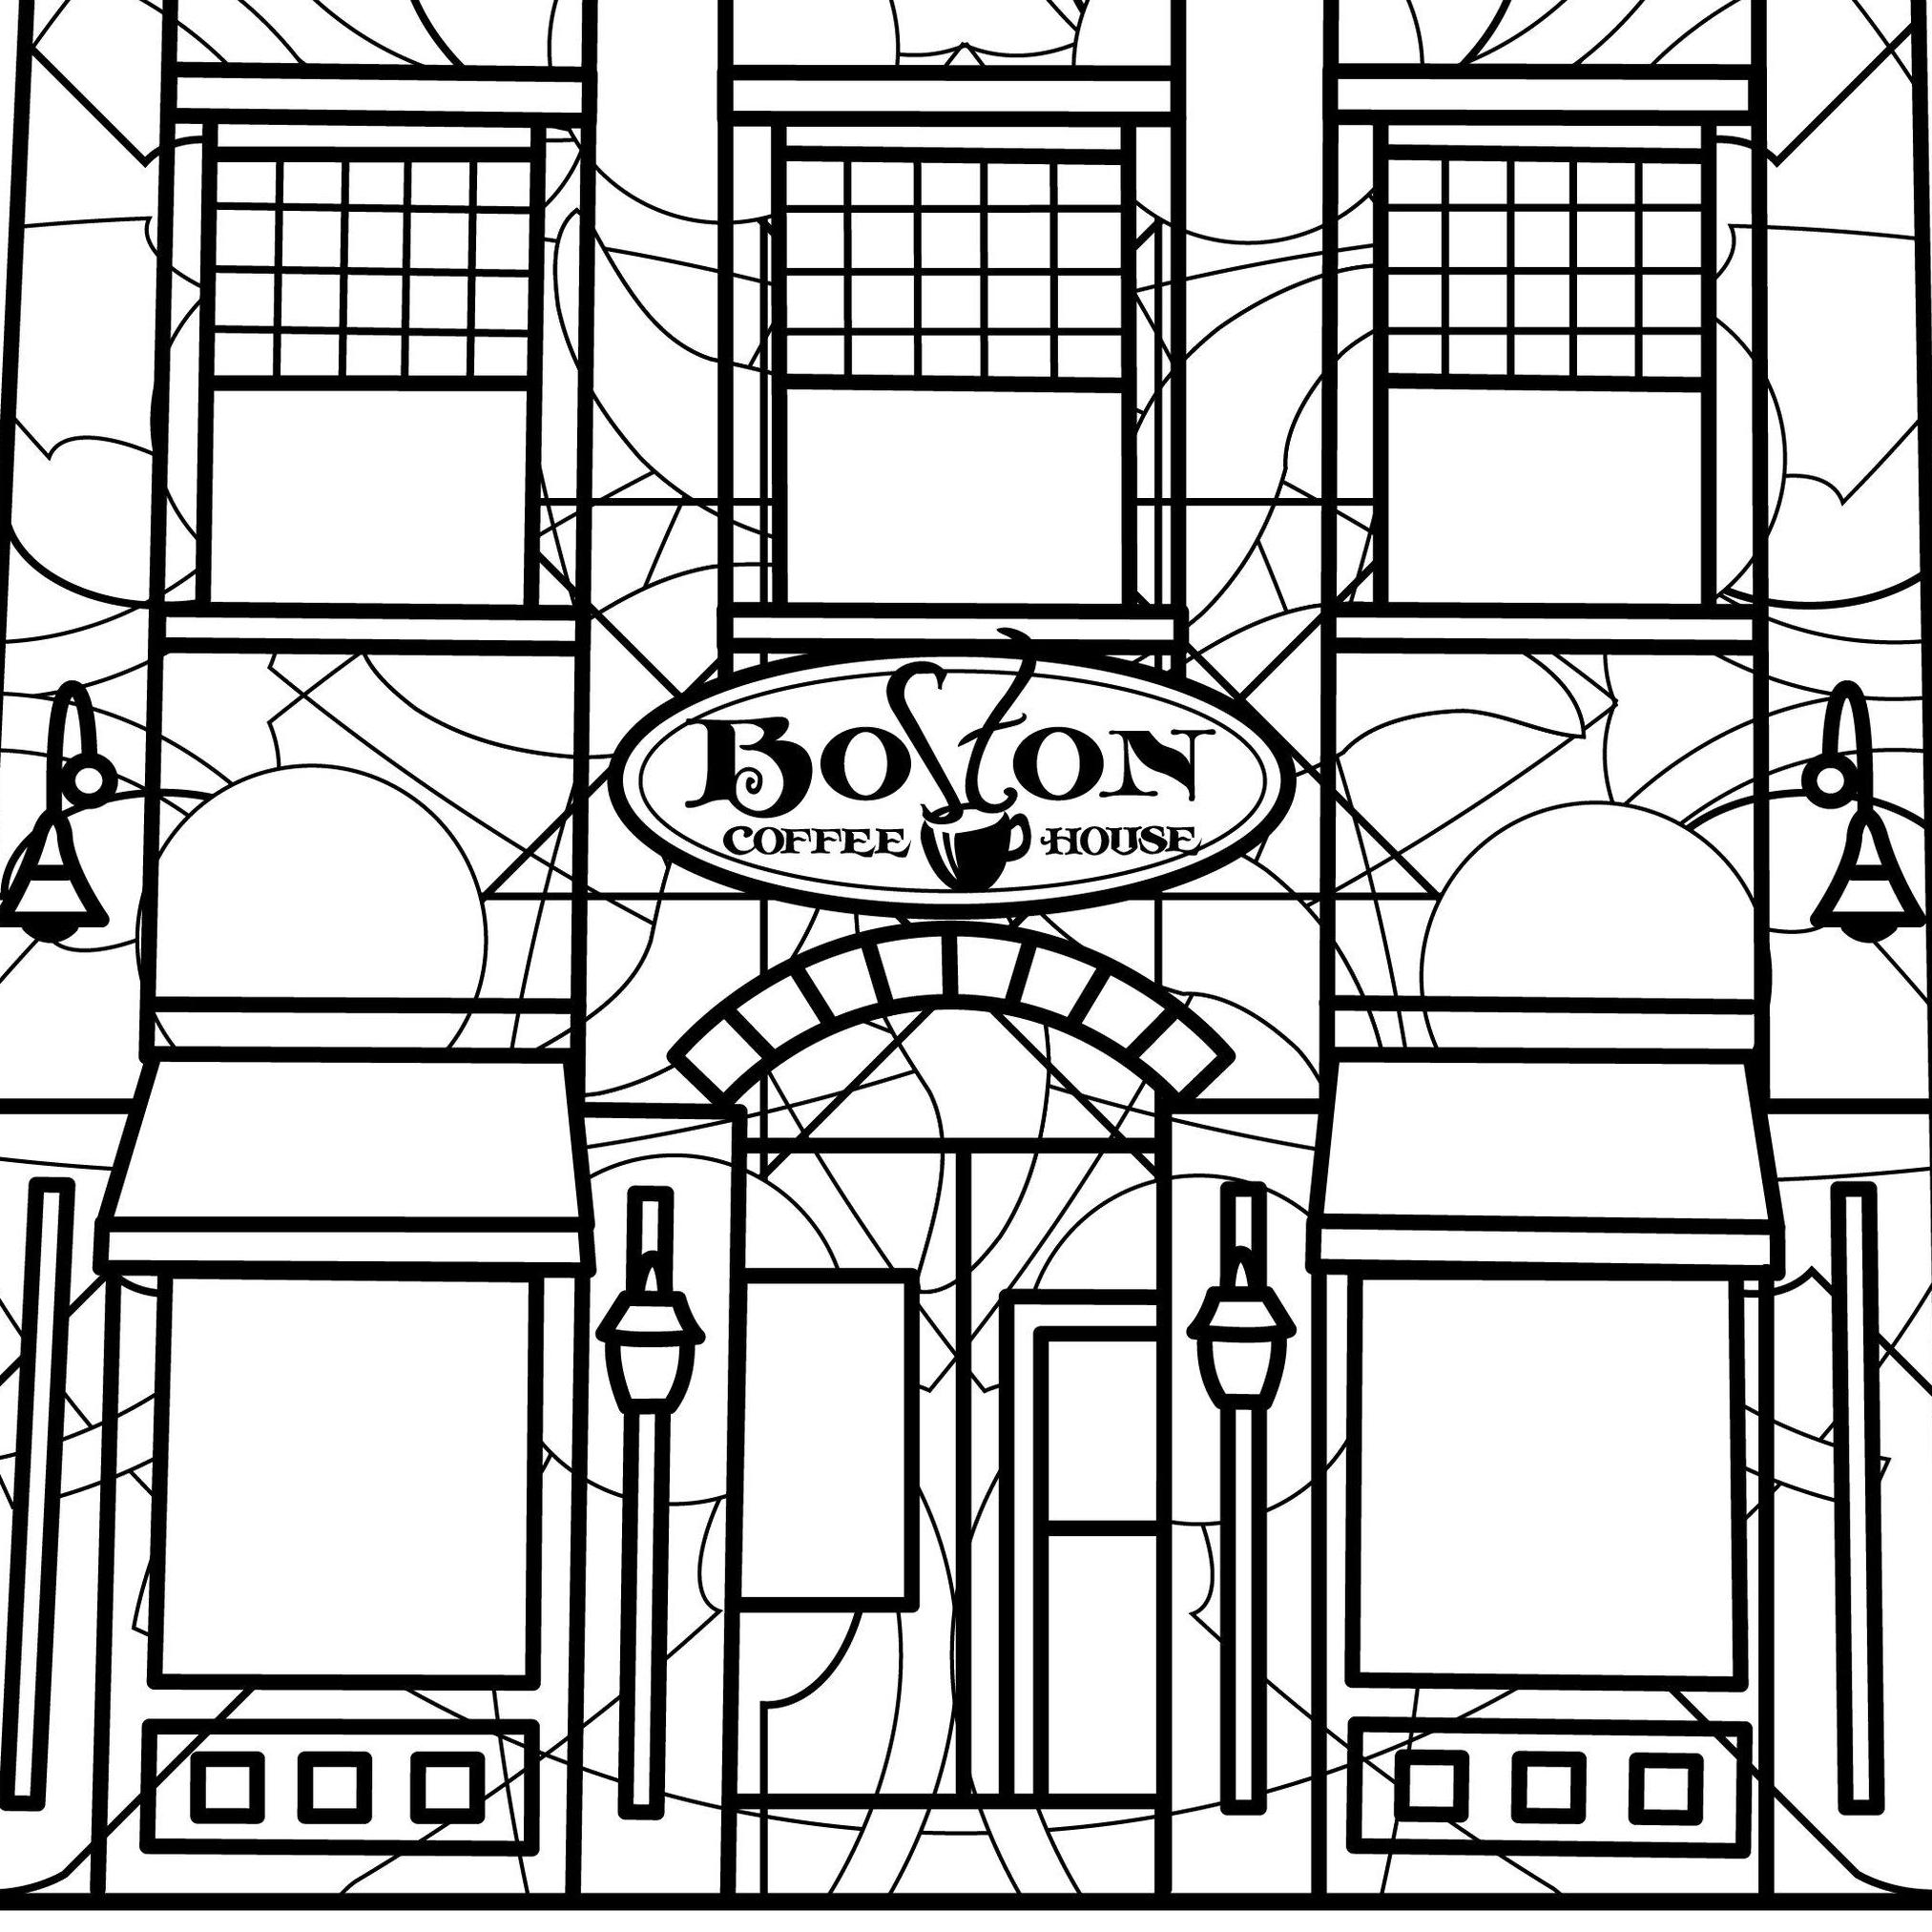 17 - Boston Coffeehouse-01.jpg